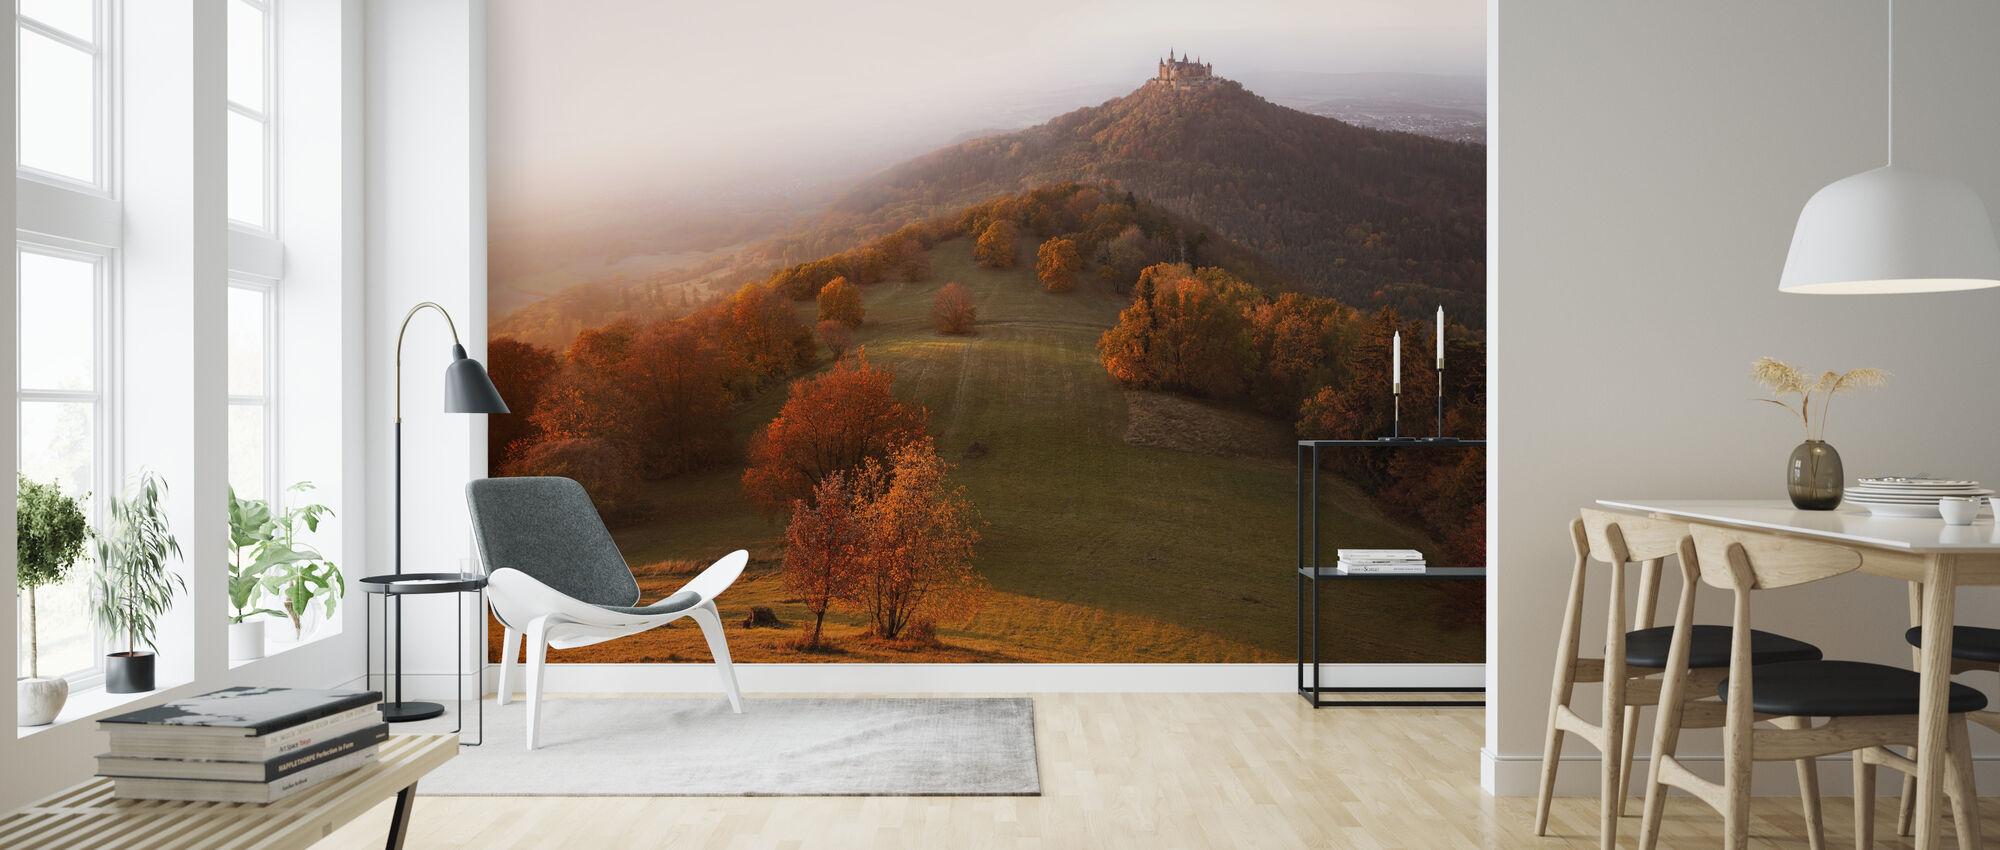 Autumn on the Swabian Alb - Wallpaper - Living Room